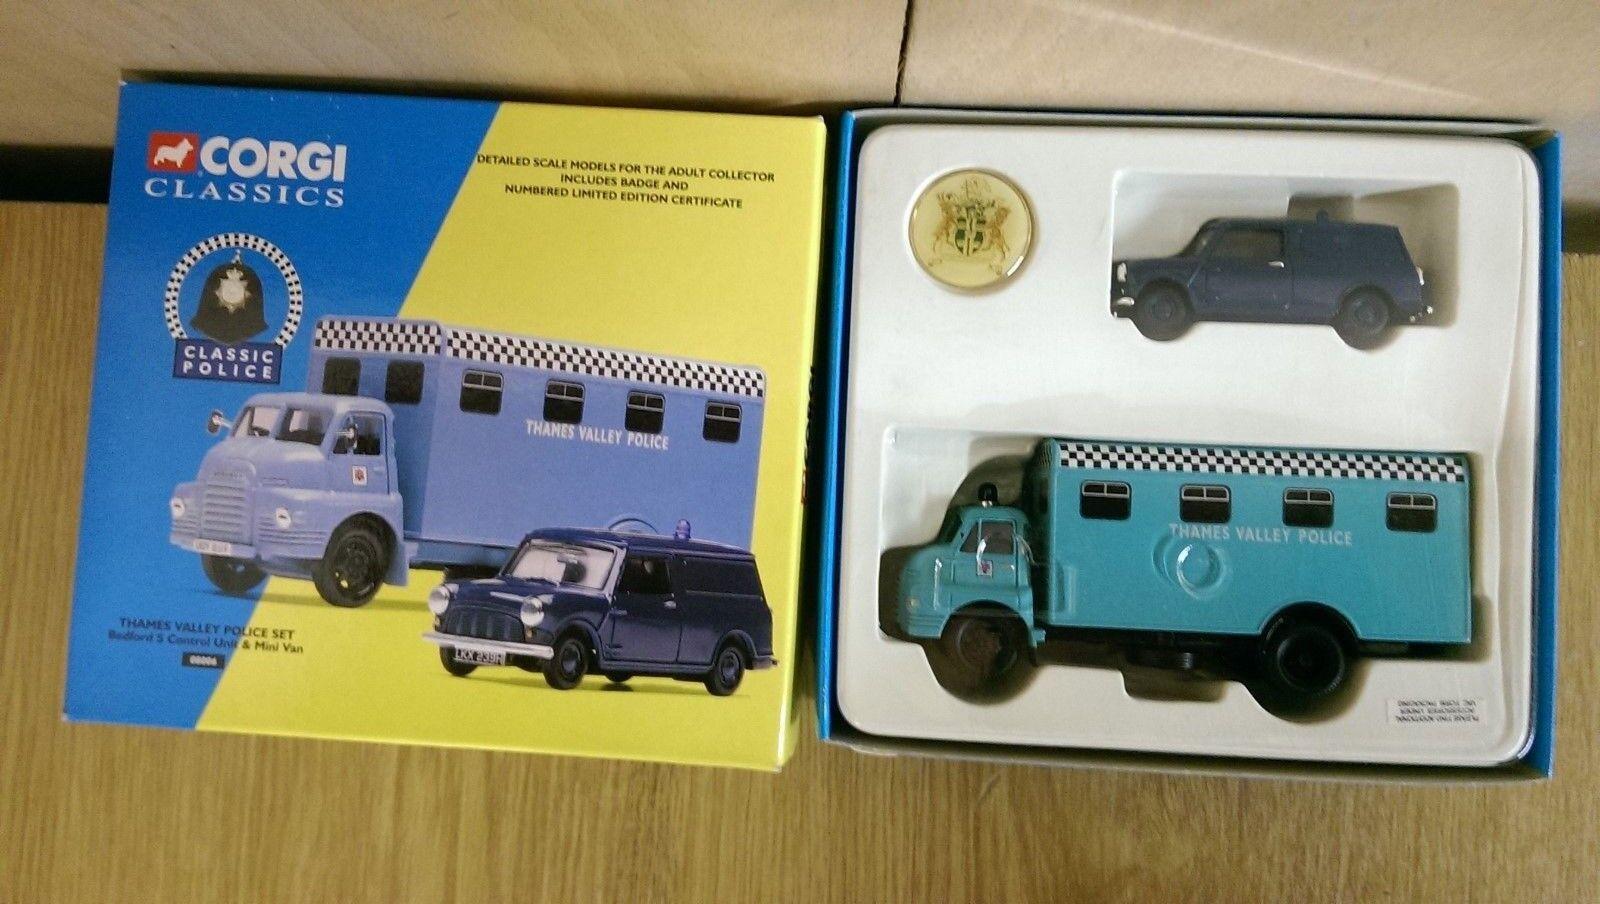 Corgi Classics 08006 Thames Valley Police Set Ltd Ed No. 0004 of 4100